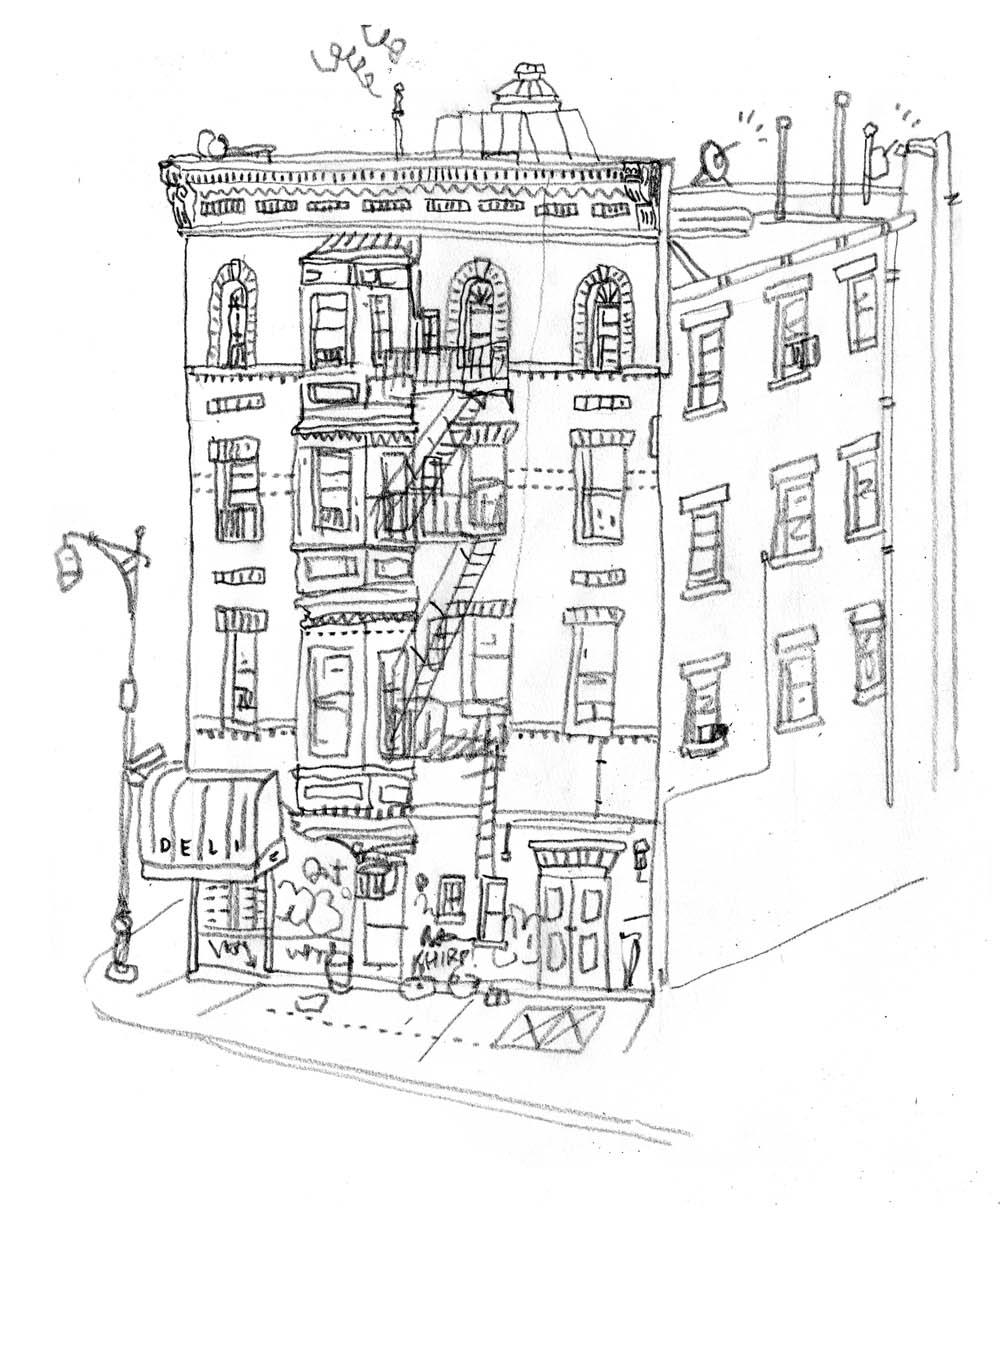 111 Franklin St. Brooklyn, NY, 11222